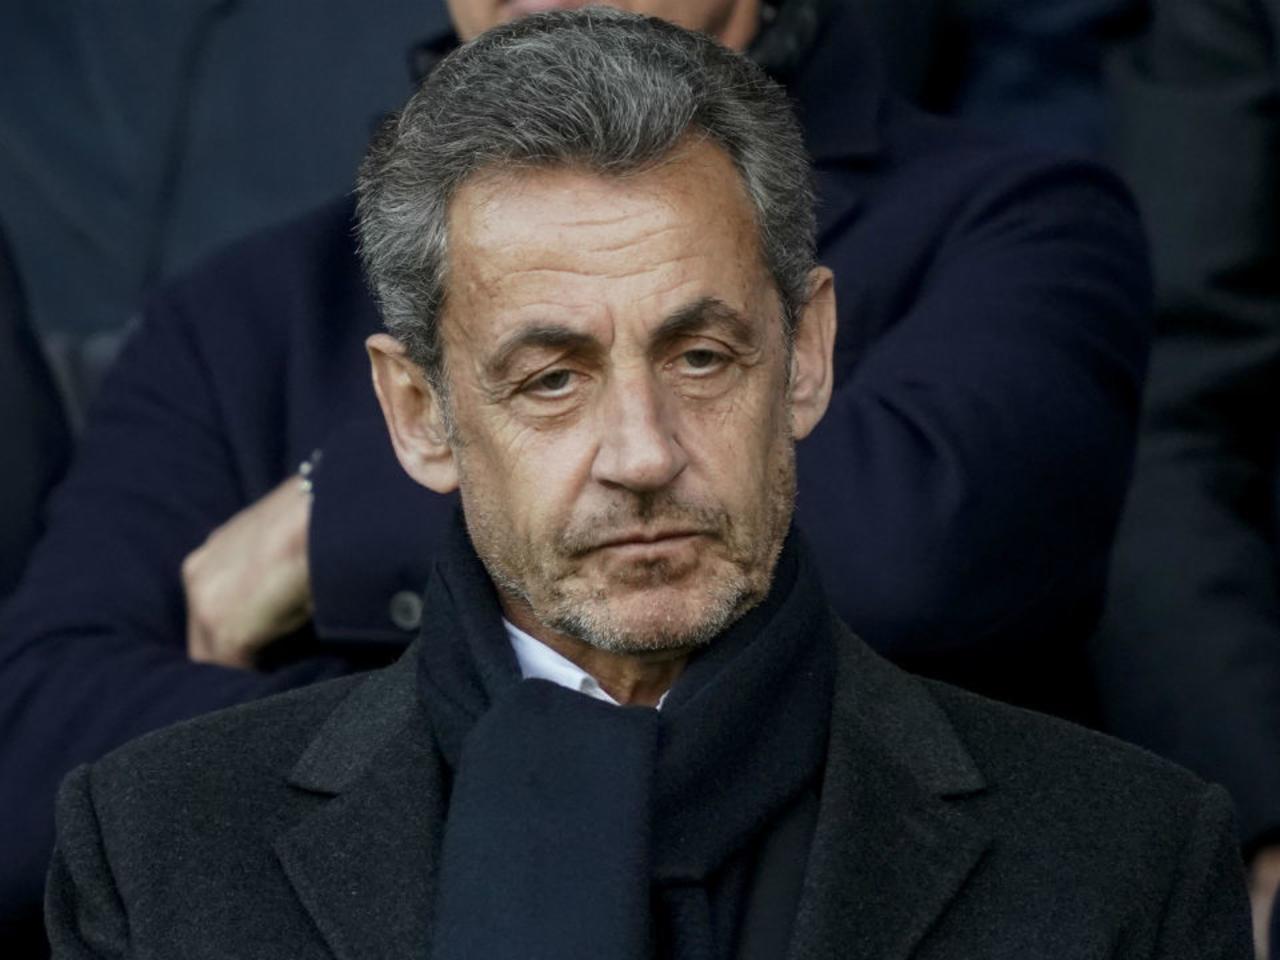 Ex-France President Nicolas Sarkozy Sentenced To Imprisonment For Corruption